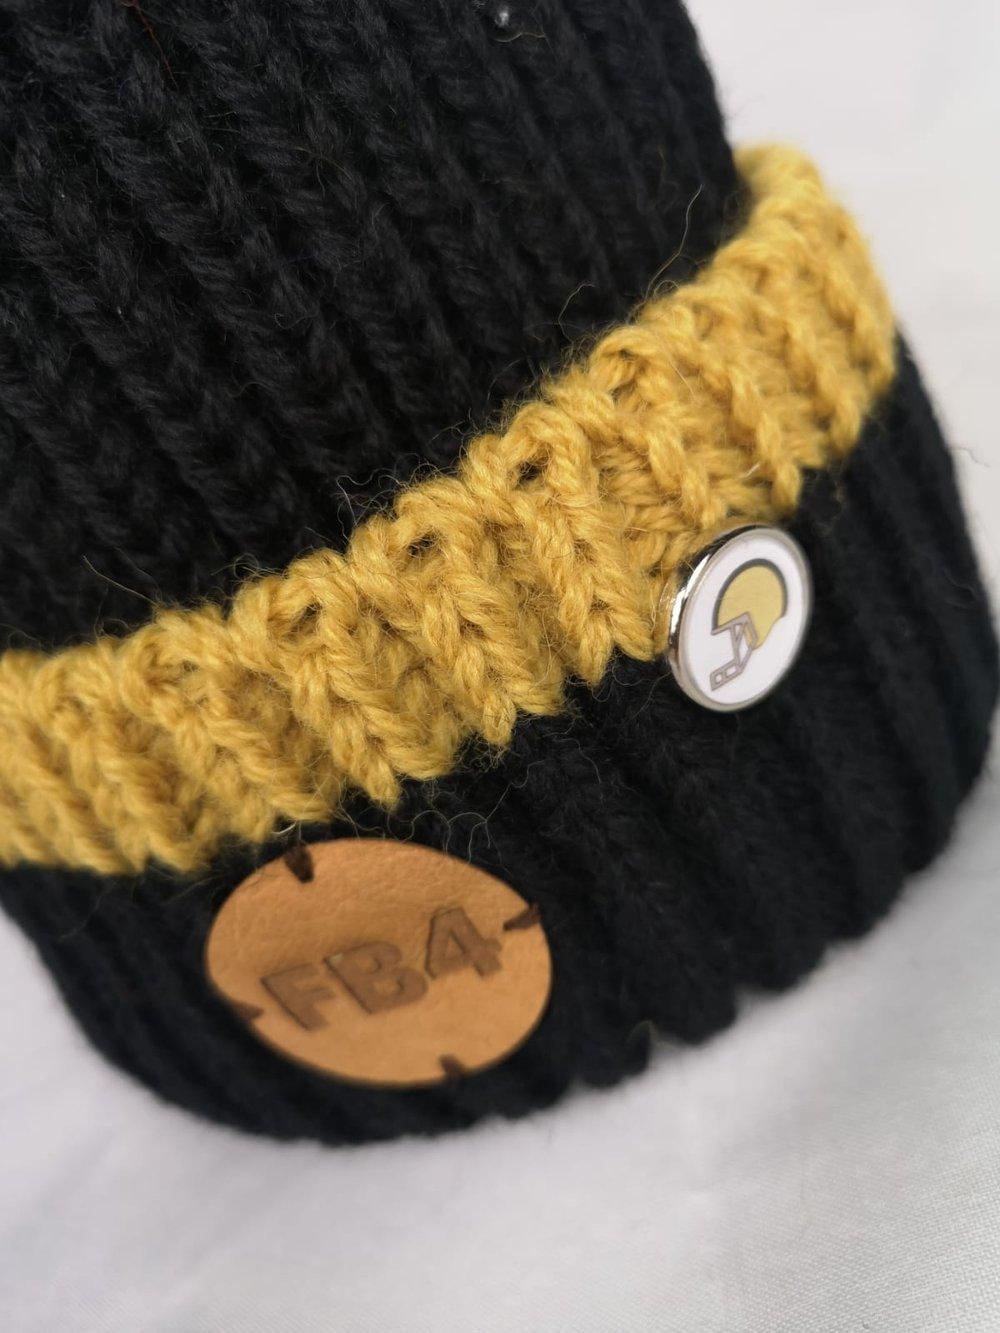 FLAT BACK 4 'NEW ORLEANS' 100% BRITISH WOOL BOBBLE HAT